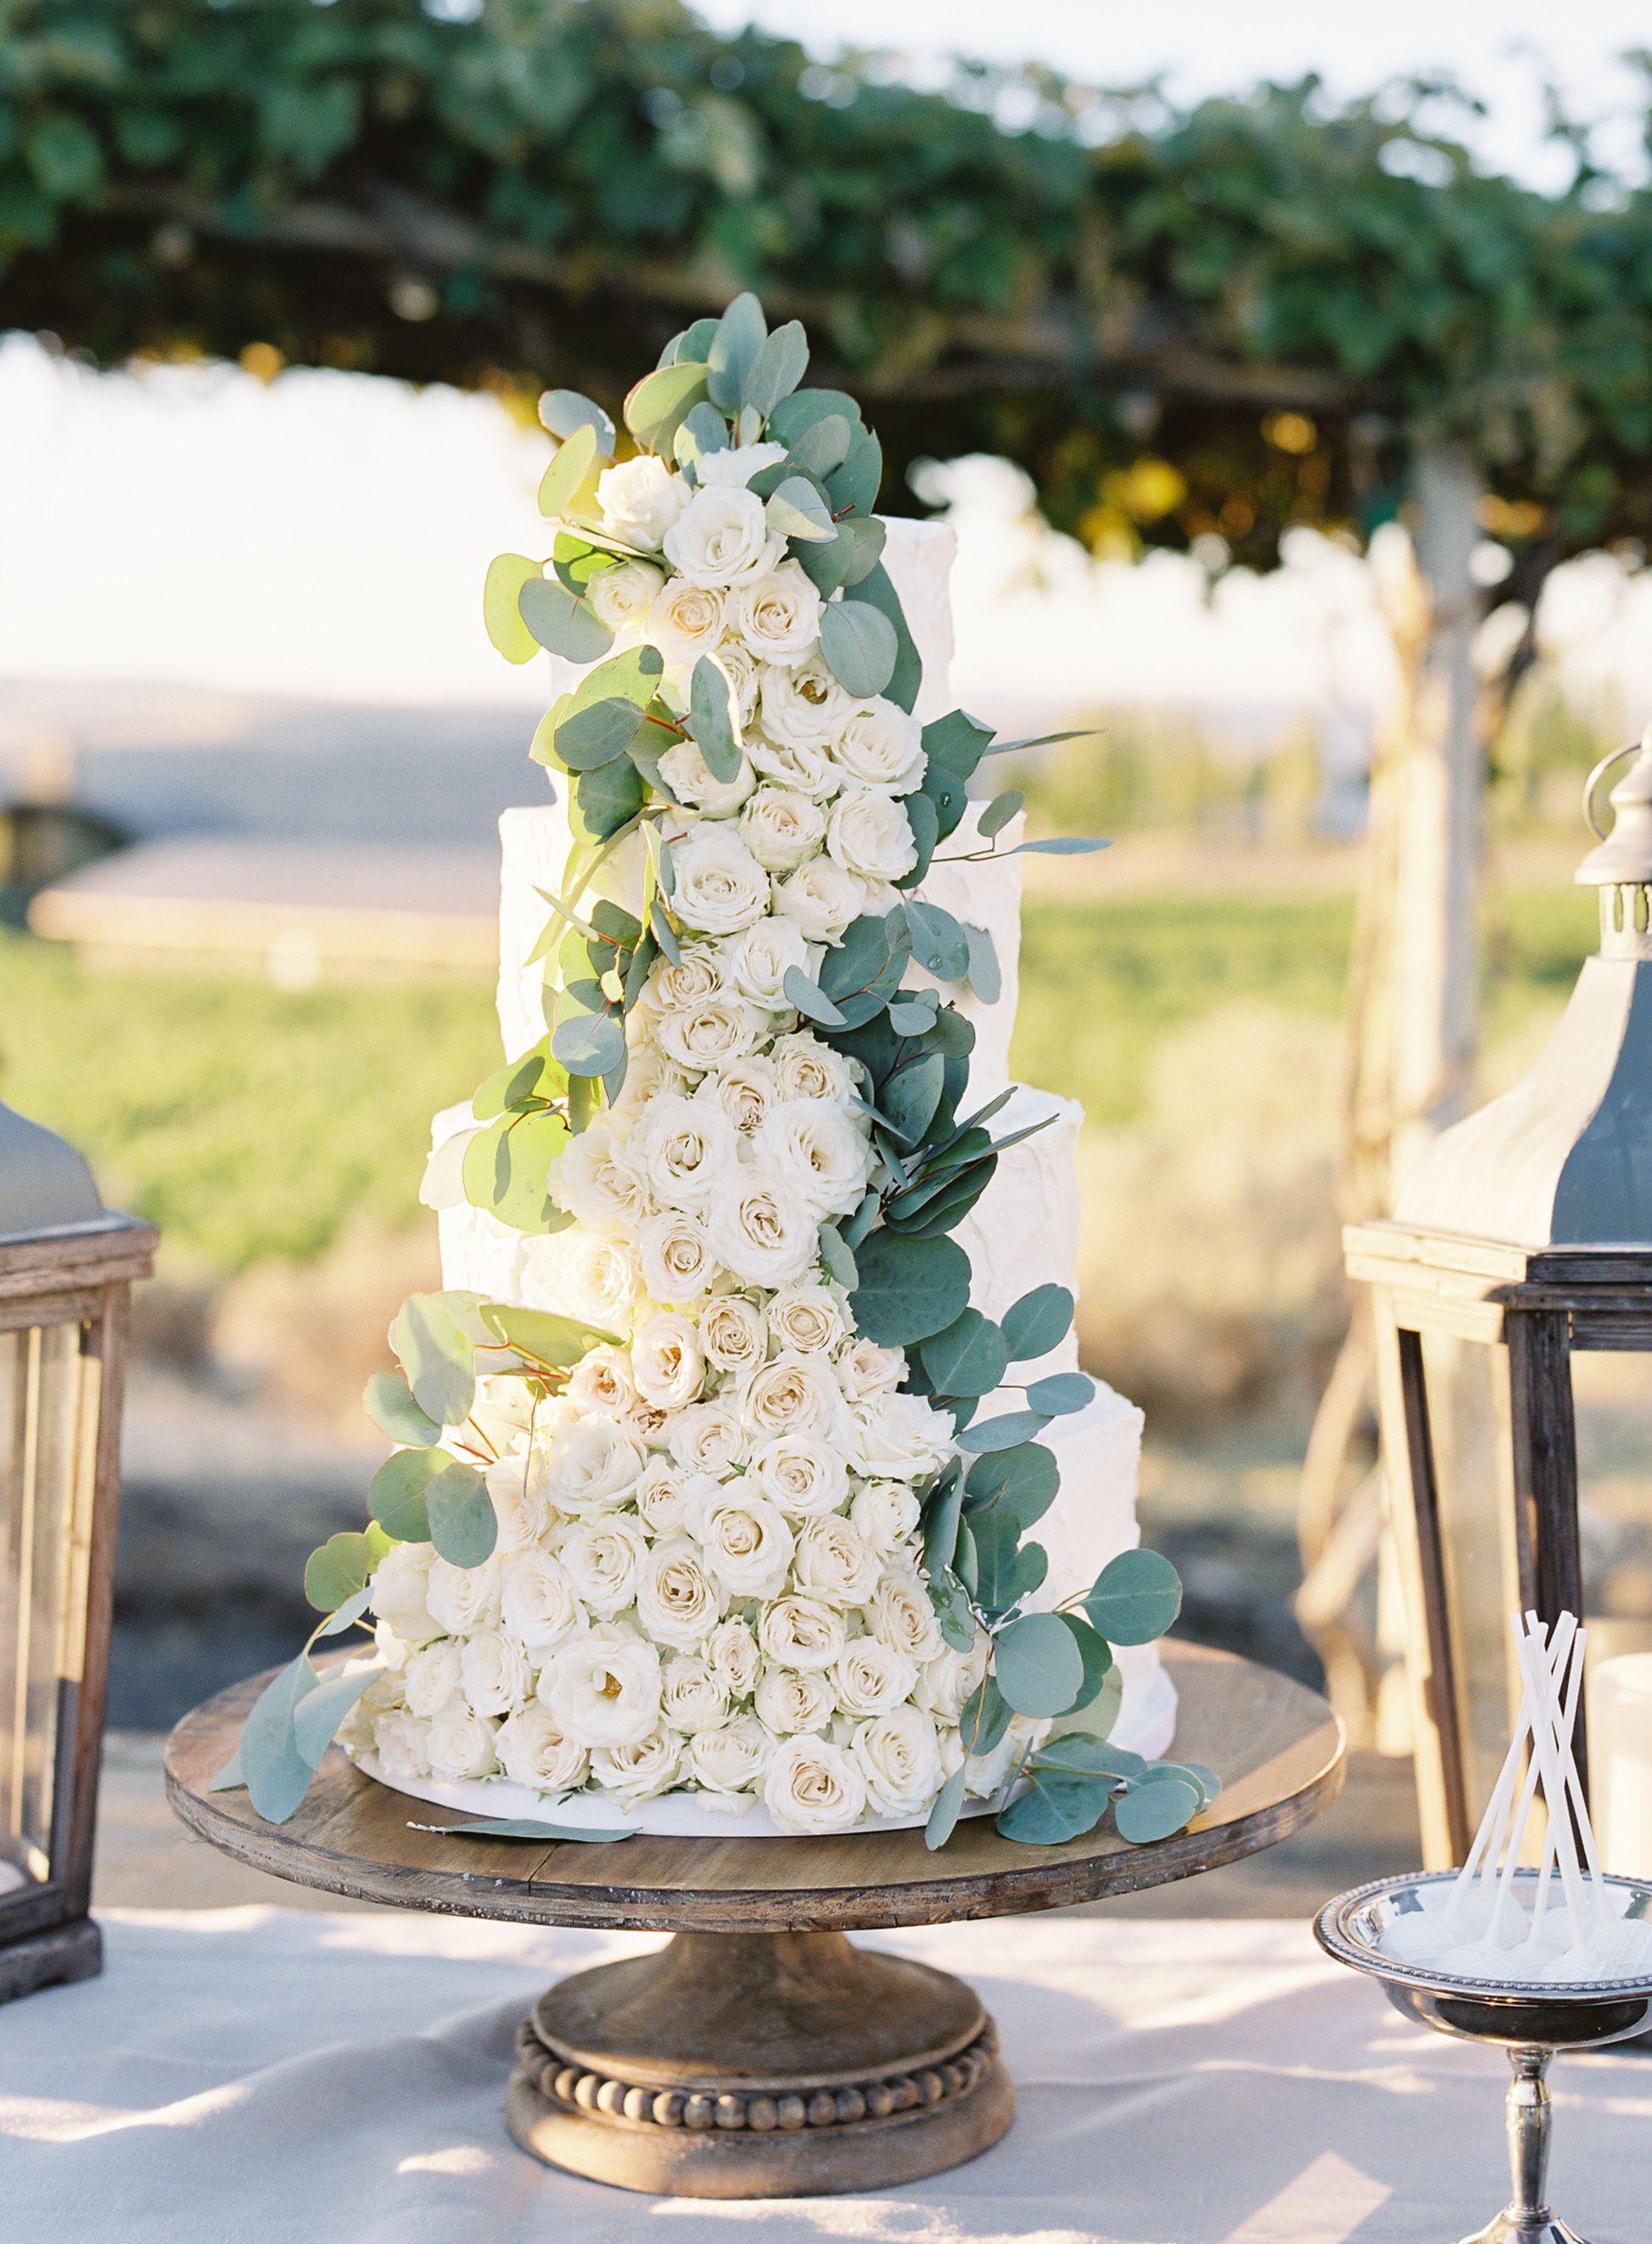 Wedding Cake Romantic Desert In The North West